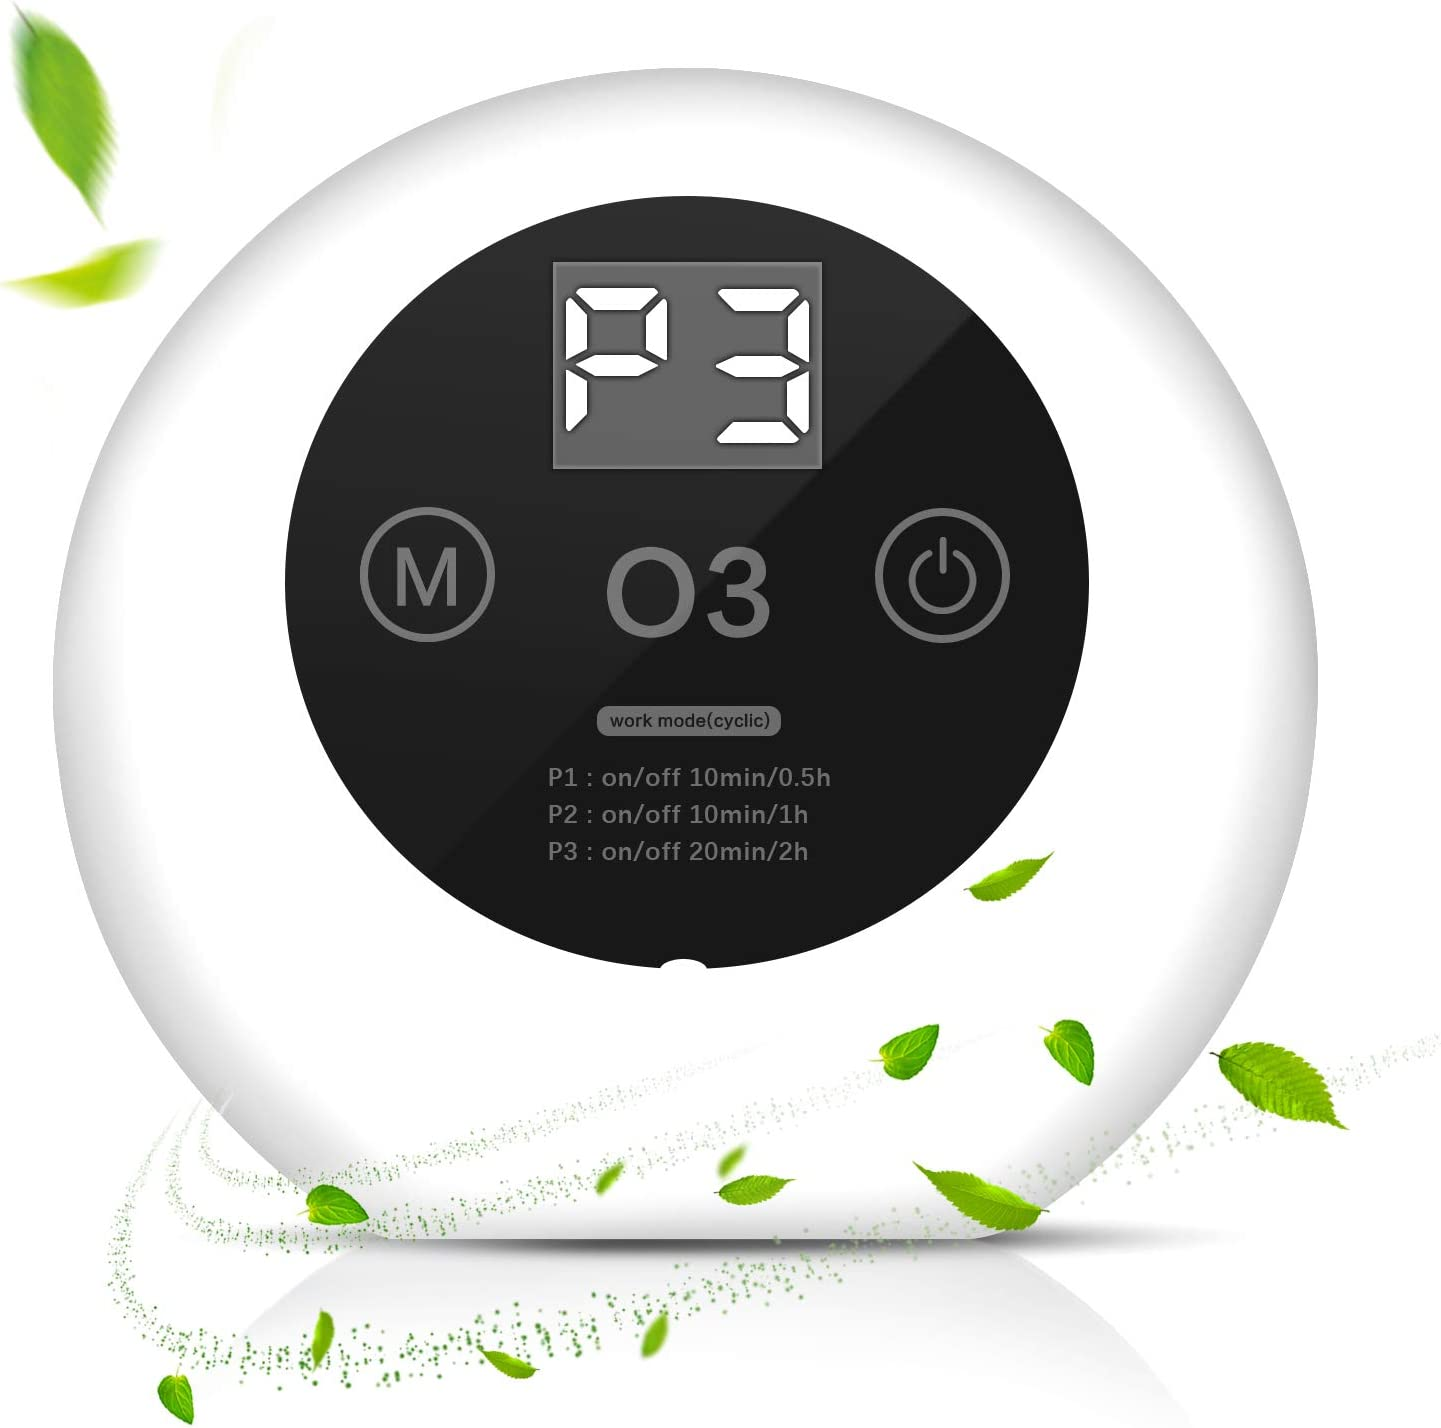 Collen Purificador de Aire Portátil, Generador de Ozono para Hogar Esterilización Desodorización, Ionizador de Aire Silencioso, Maquina Ozono Eliminar Olor para Cocina,Baño,Habitacion,Mascota